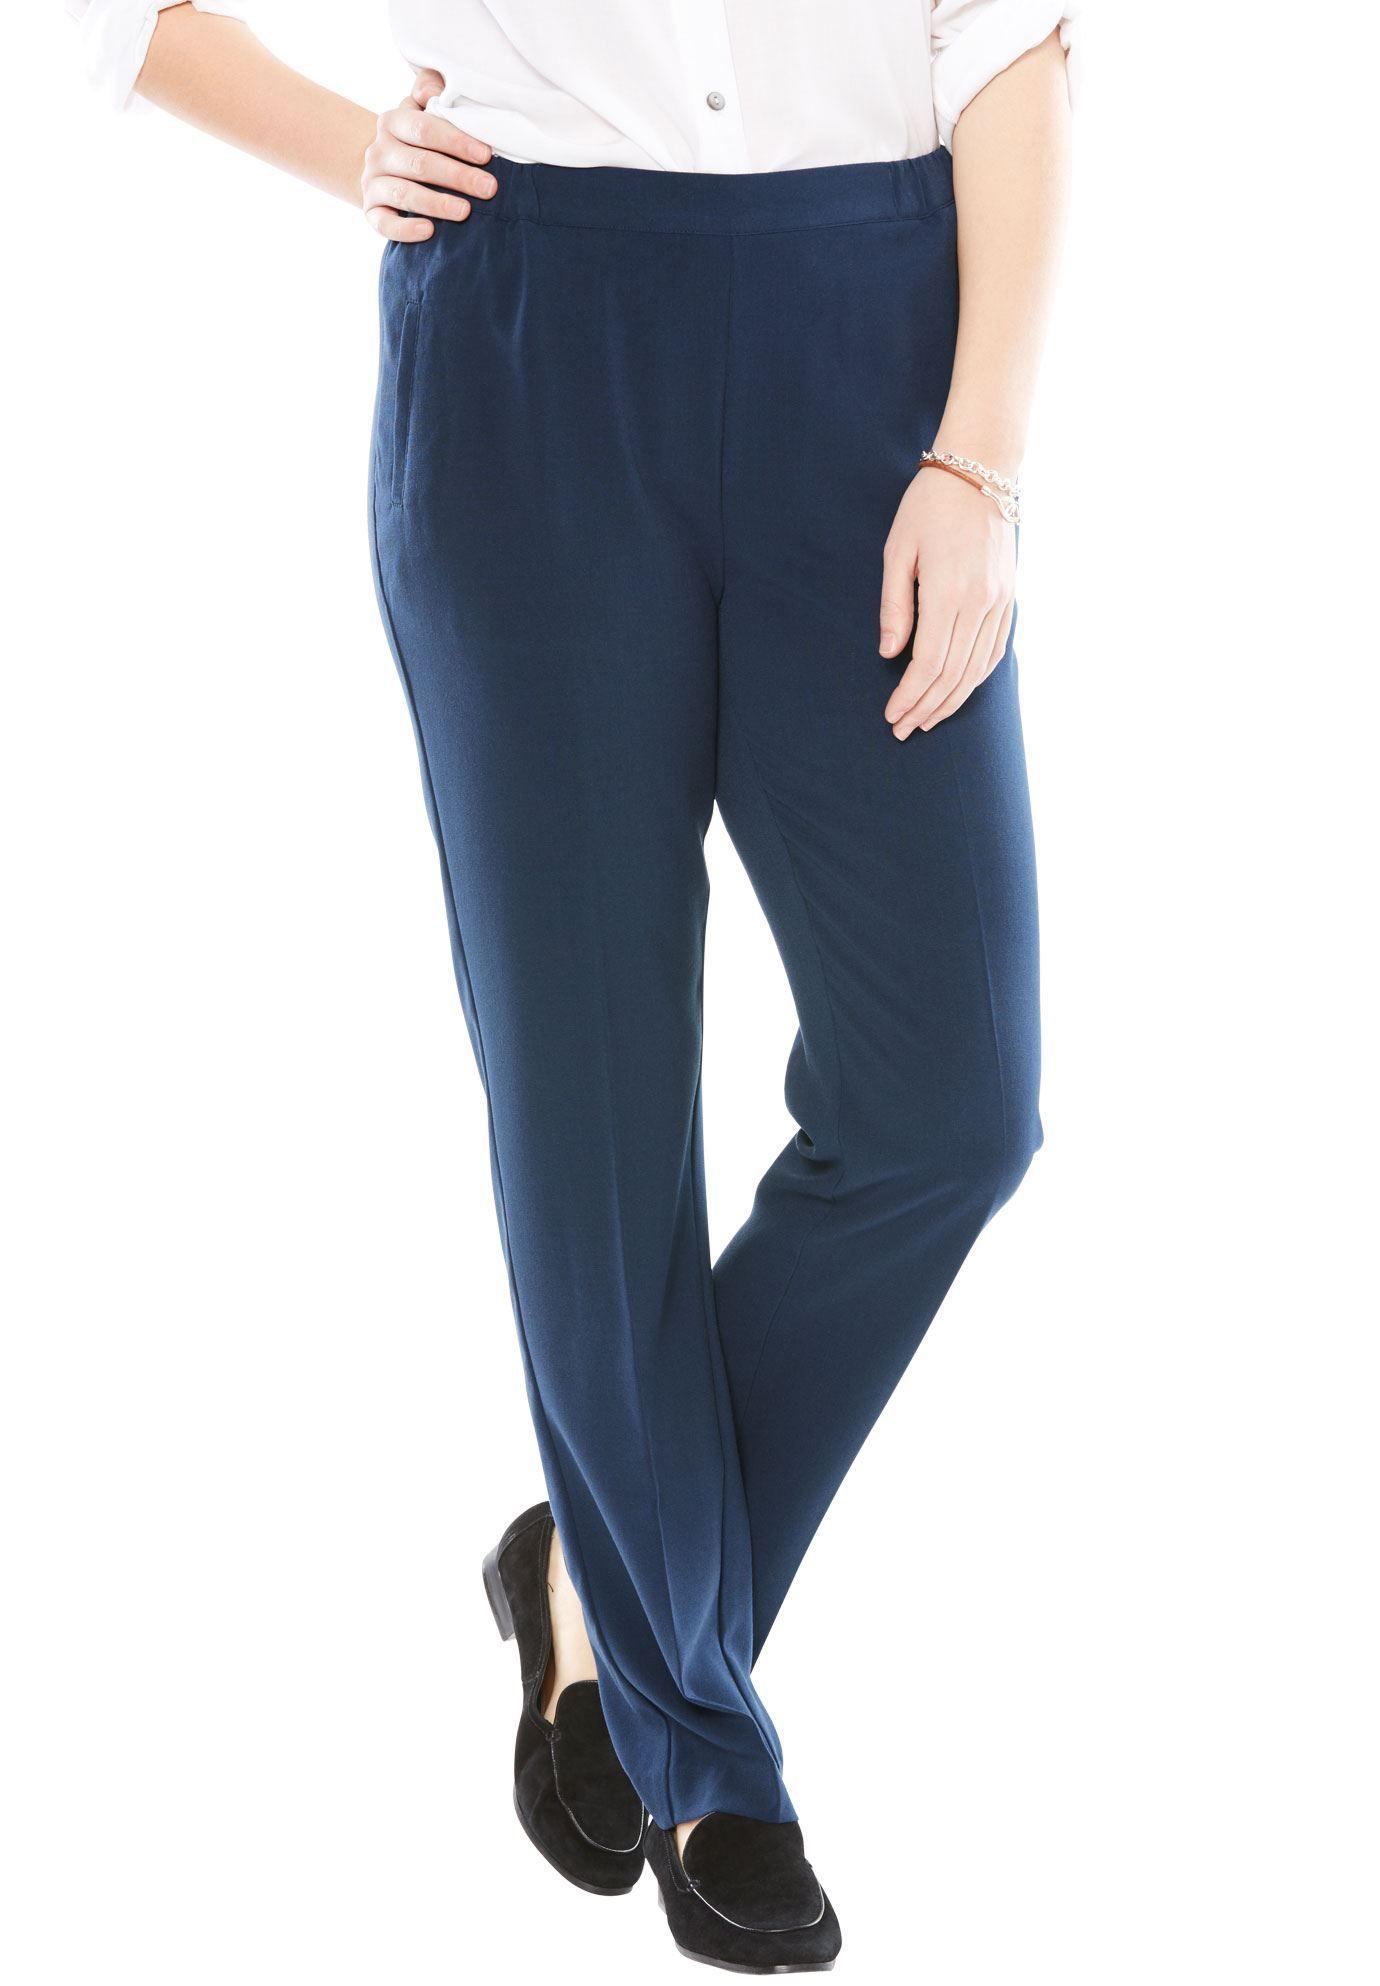 Petite trouser jean — pic 13